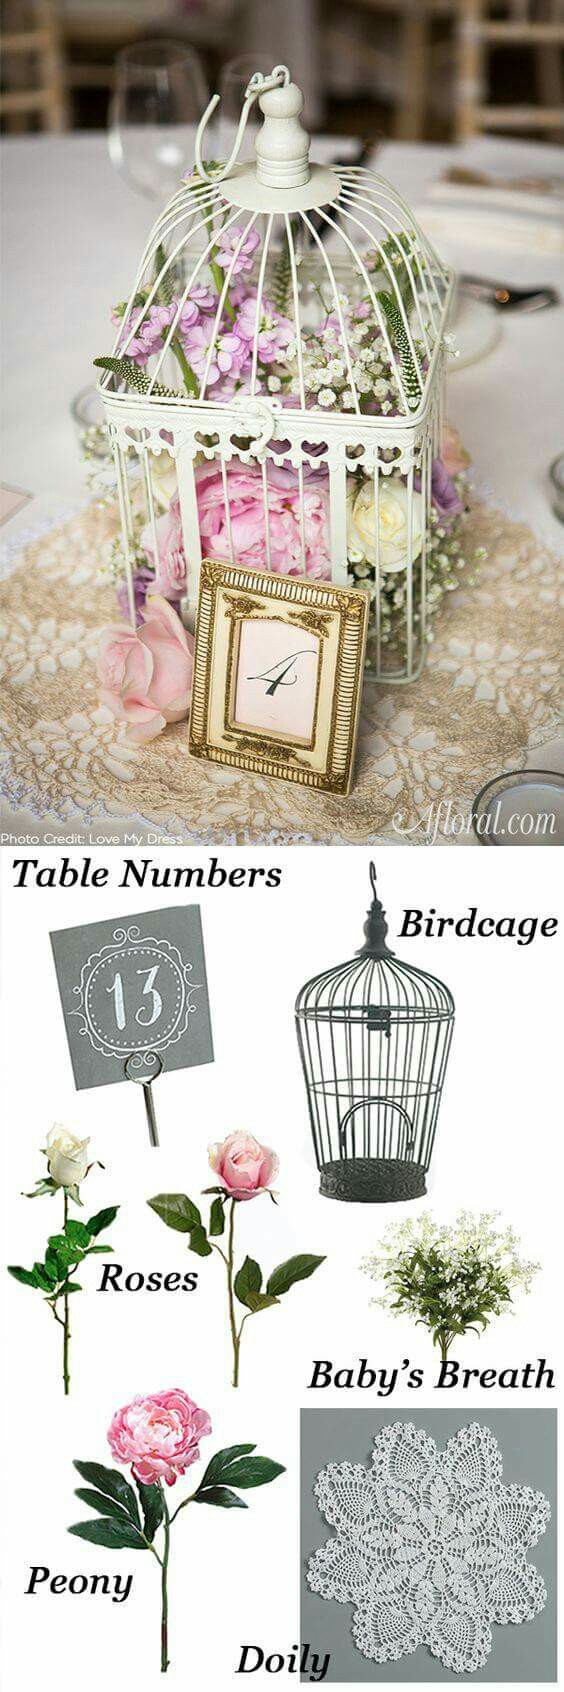 Arreglo para boda vintage | Ιδέες γάμου | Pinterest | Wedding bells ...